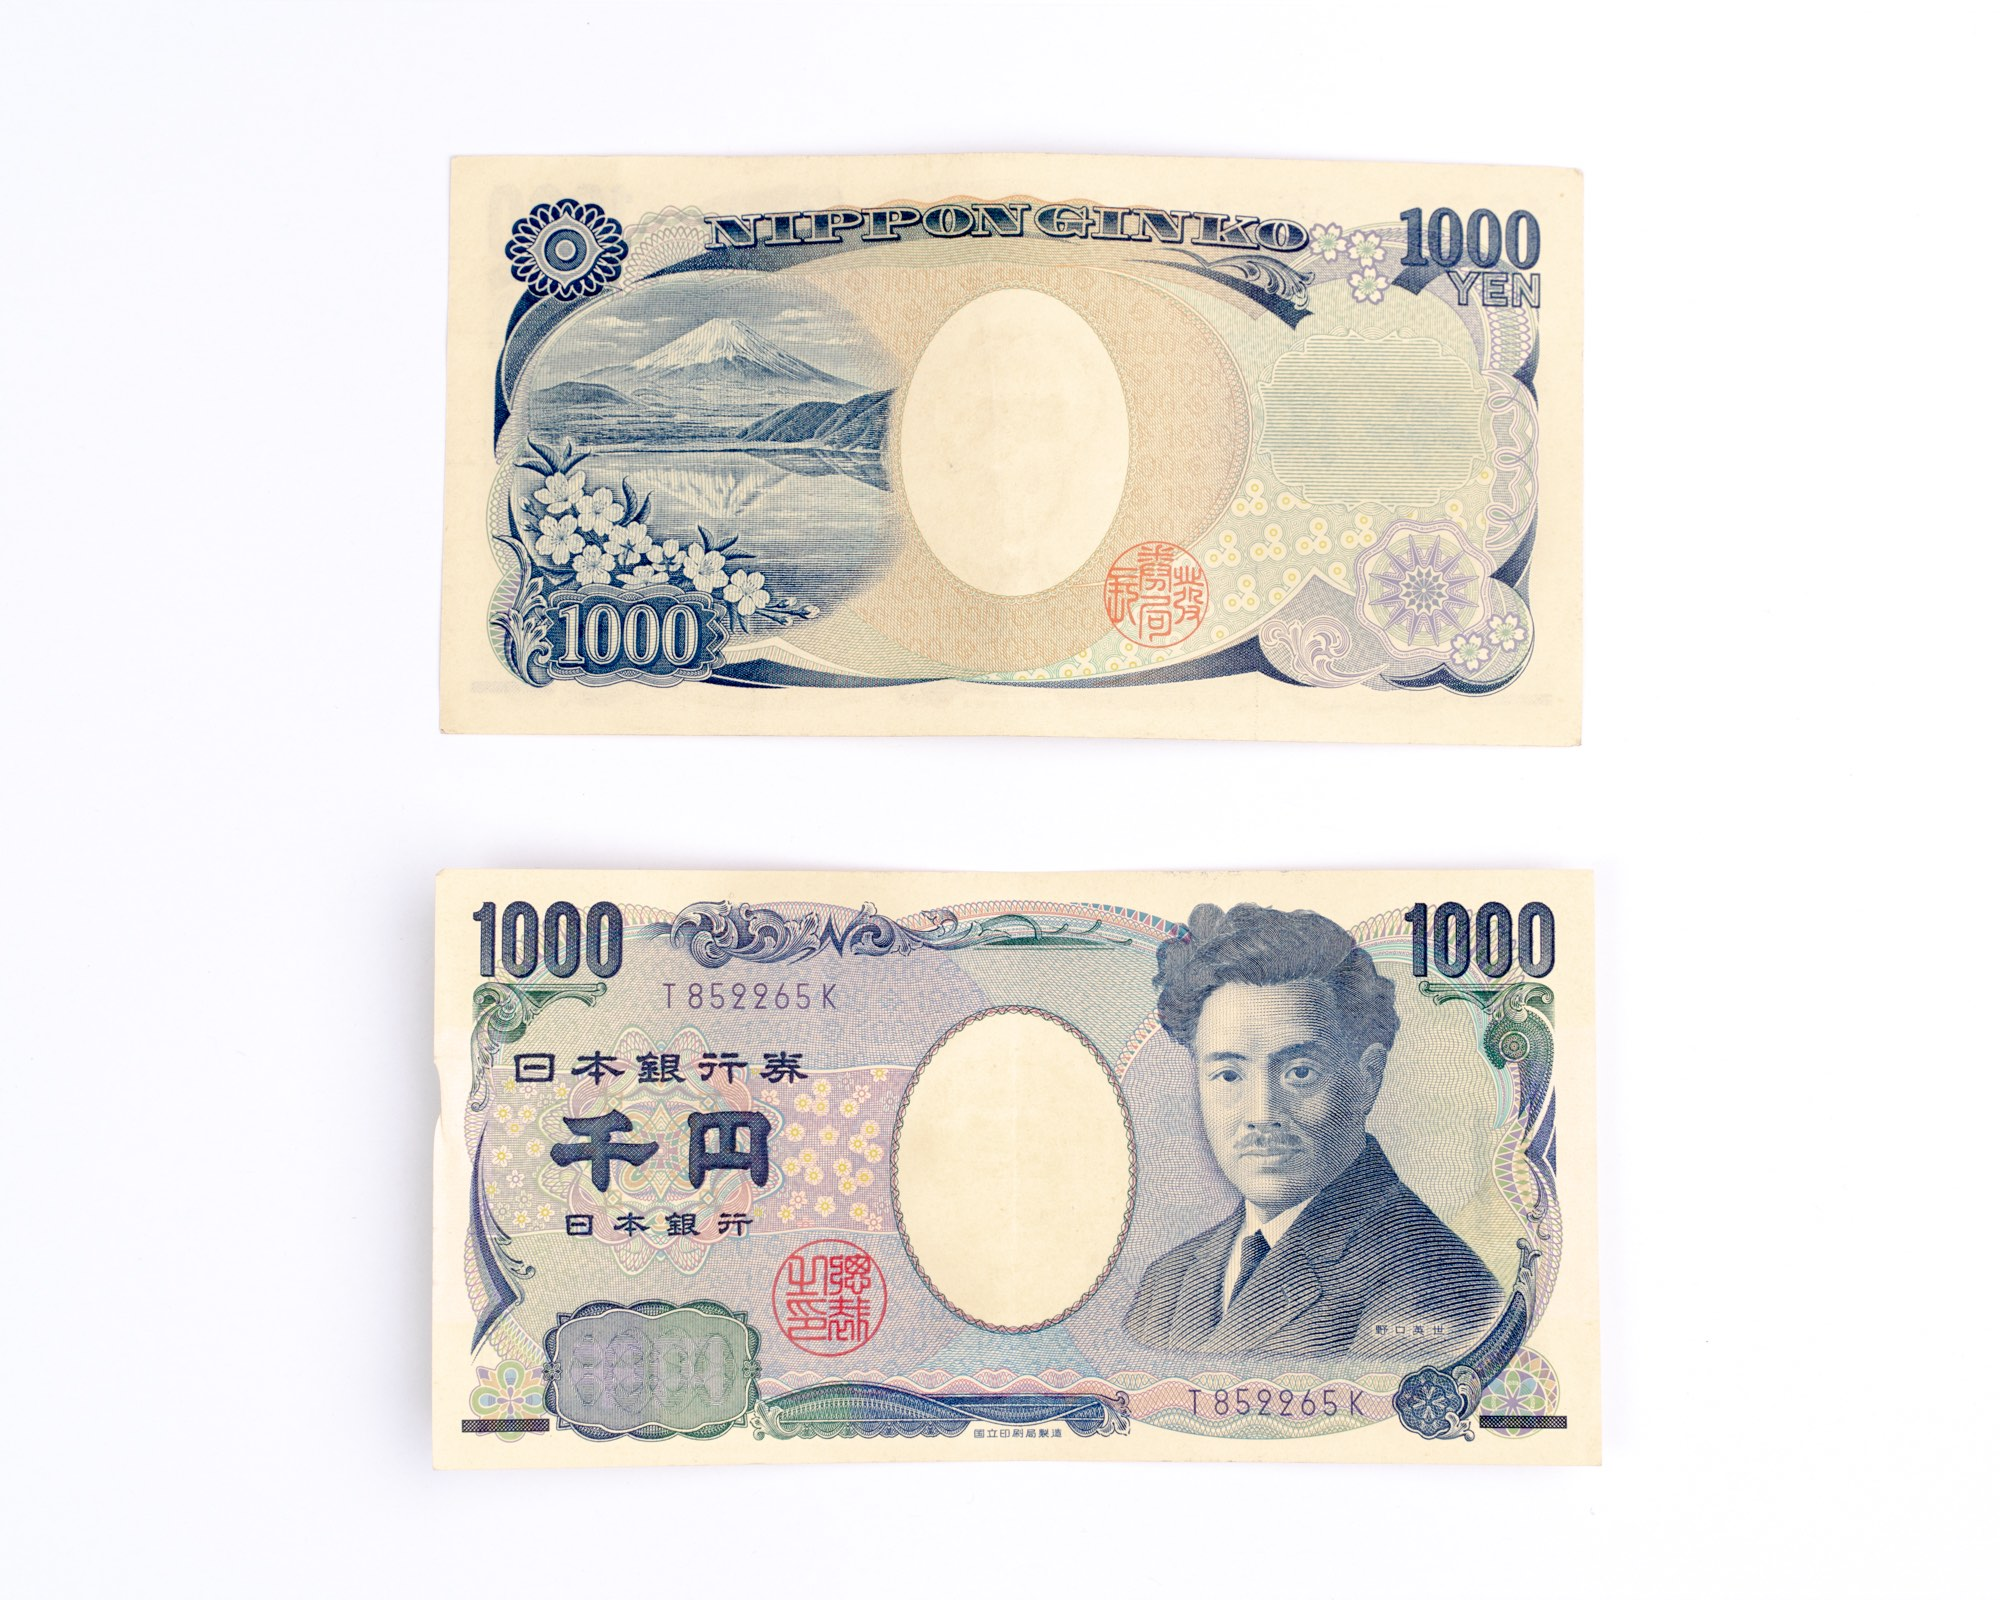 Japanese 1000 Yen banknote